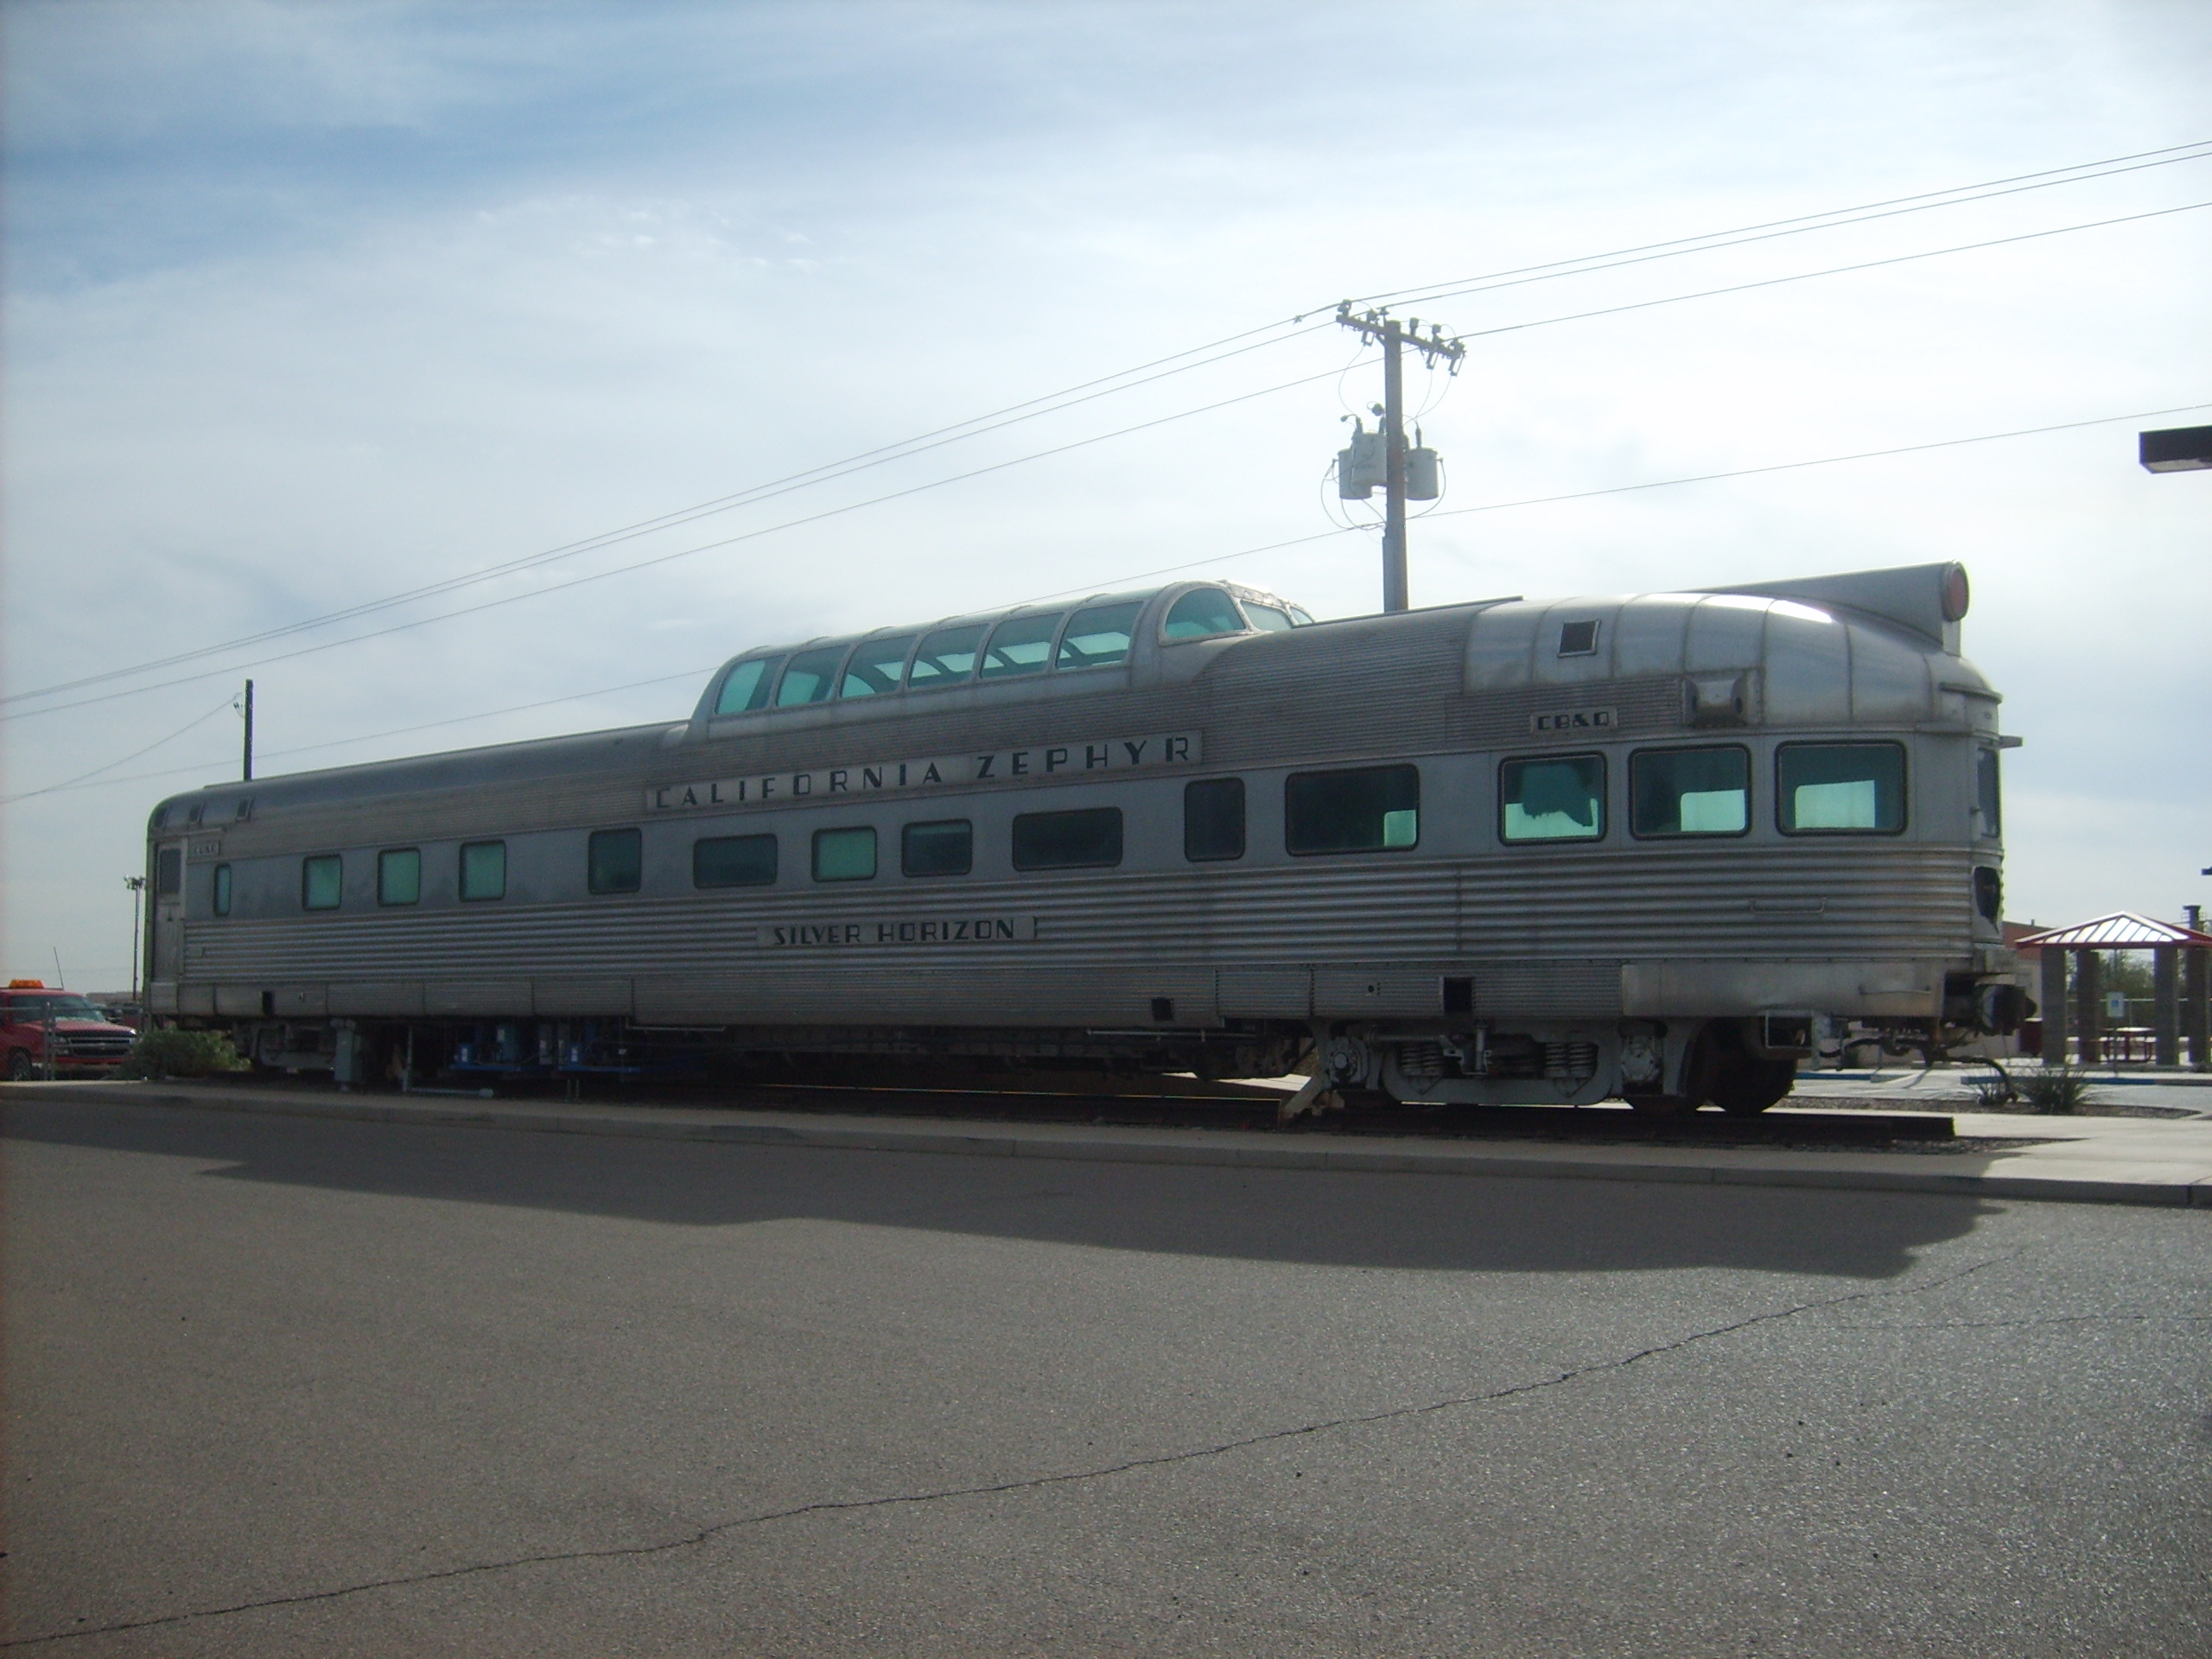 Rail Cars For Sale California